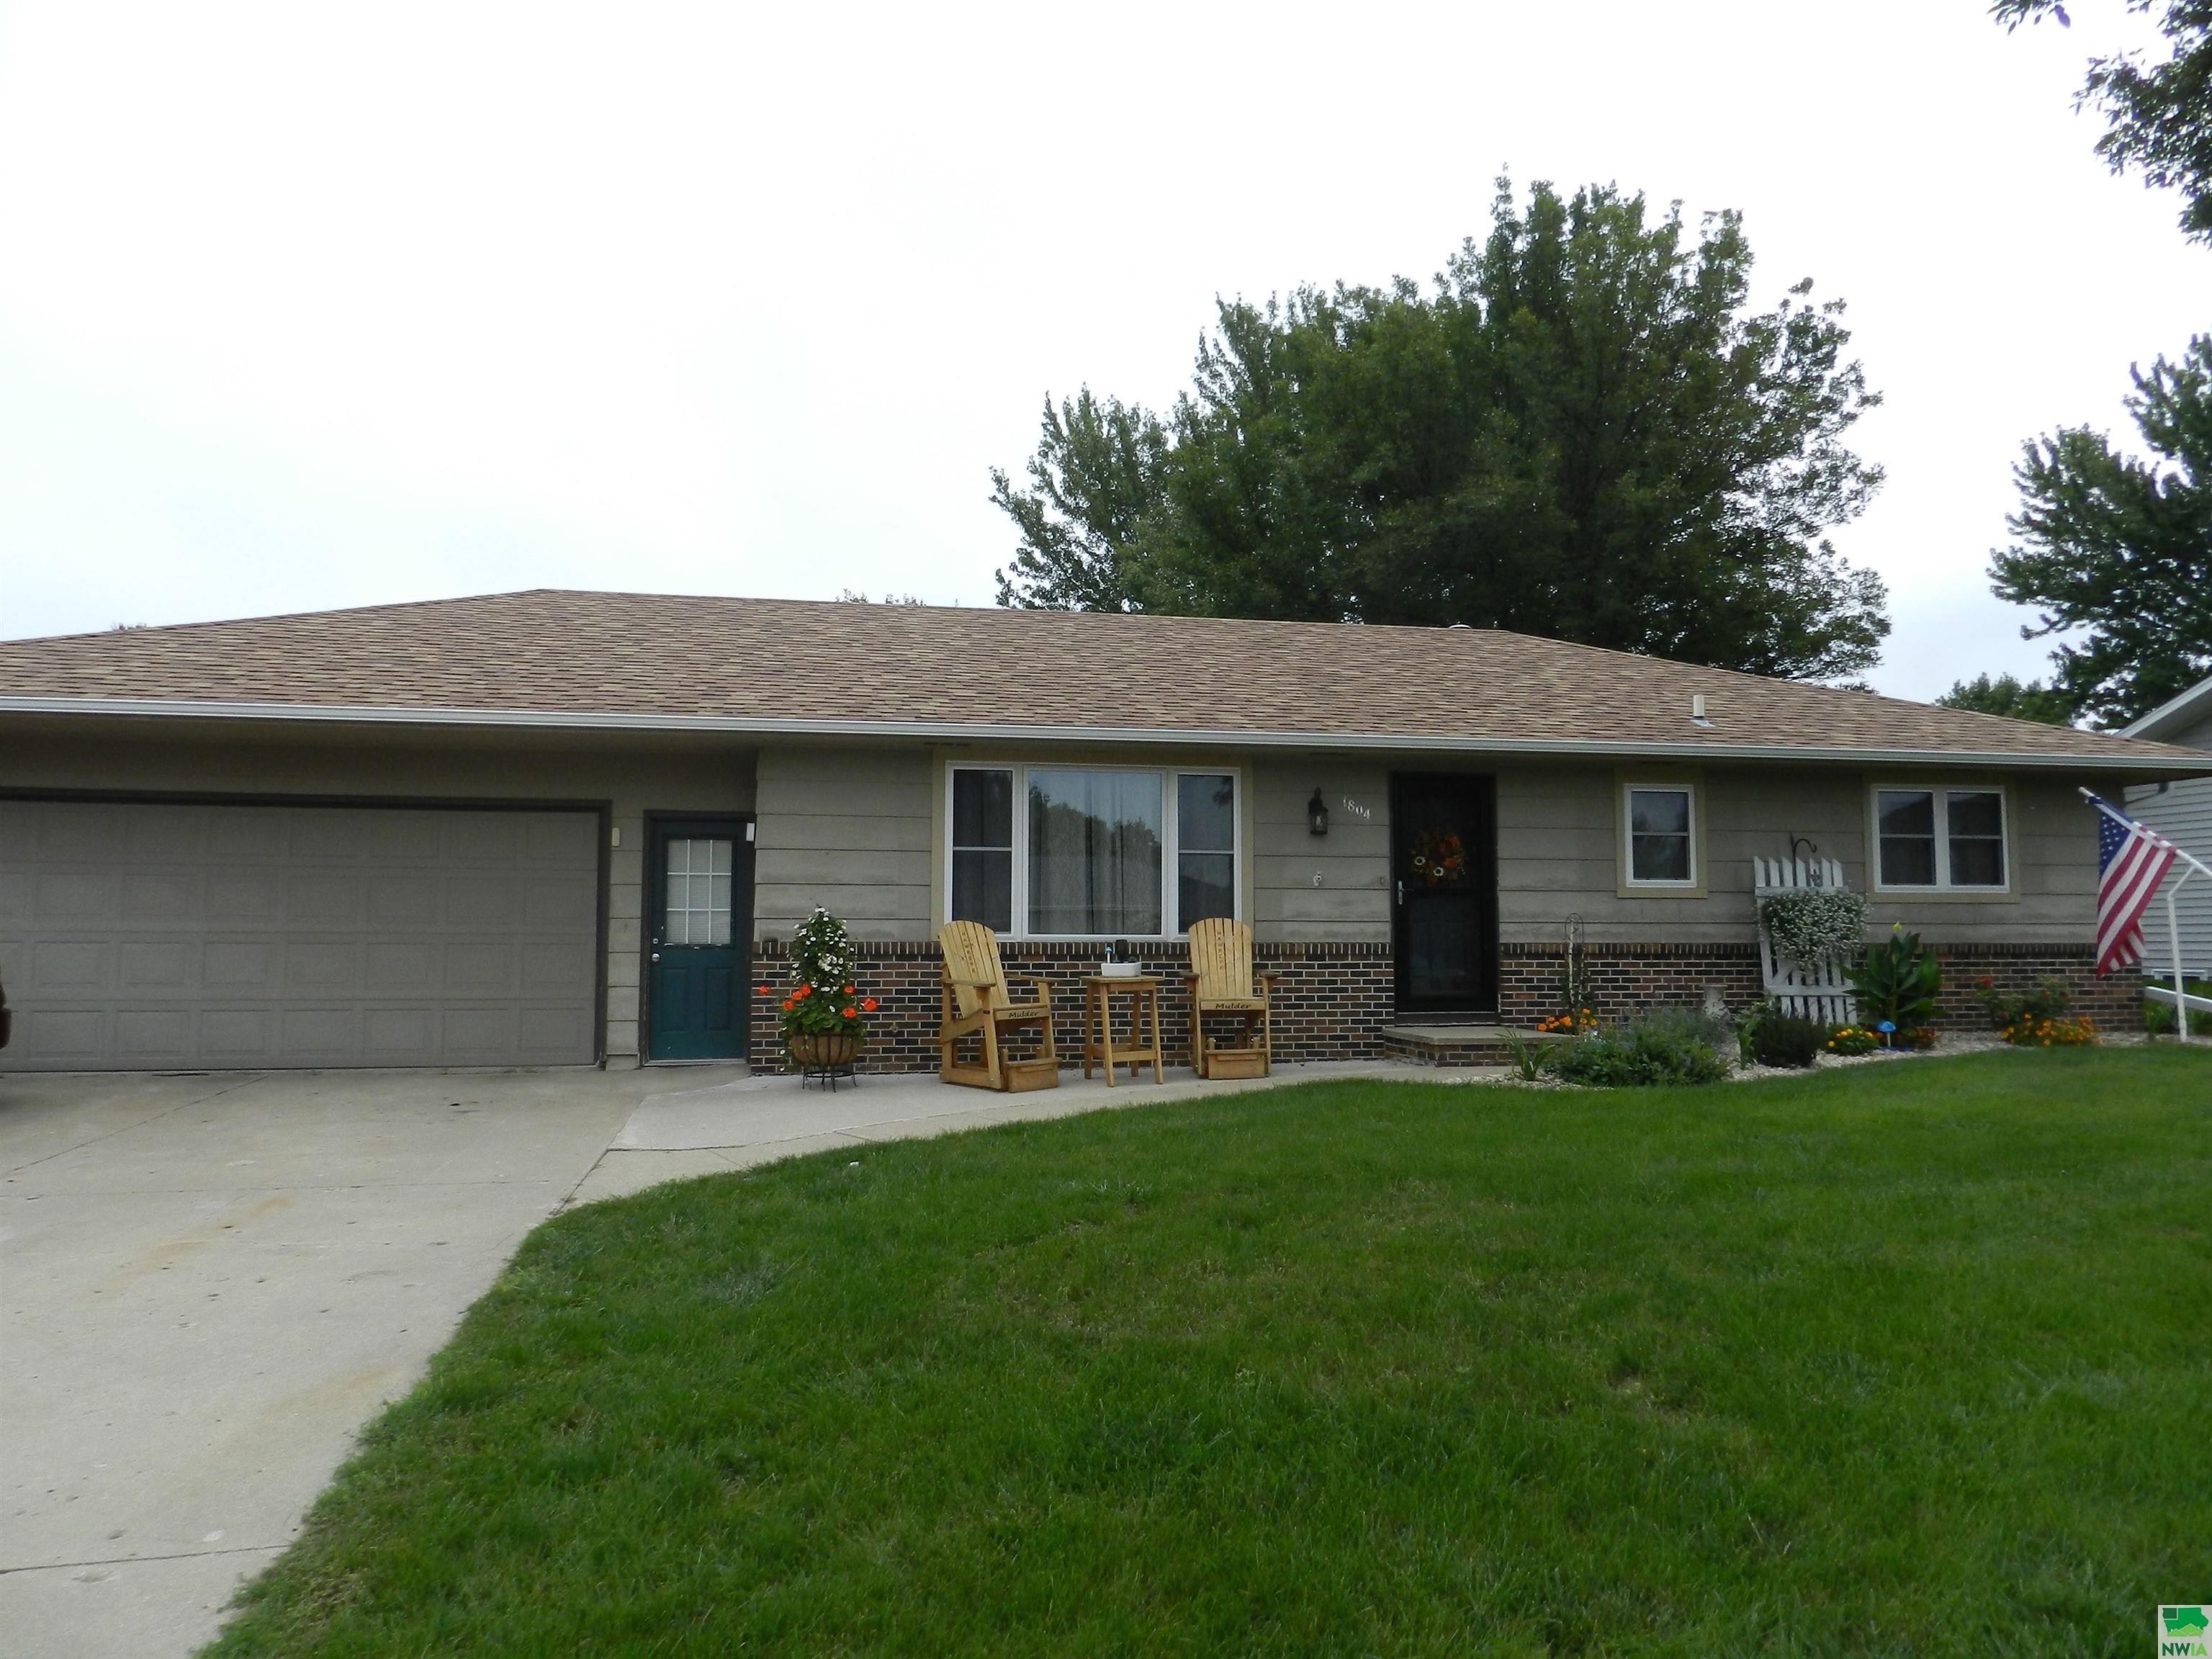 1804 2nd Ave. SE, Sioux Center, Iowa 51250